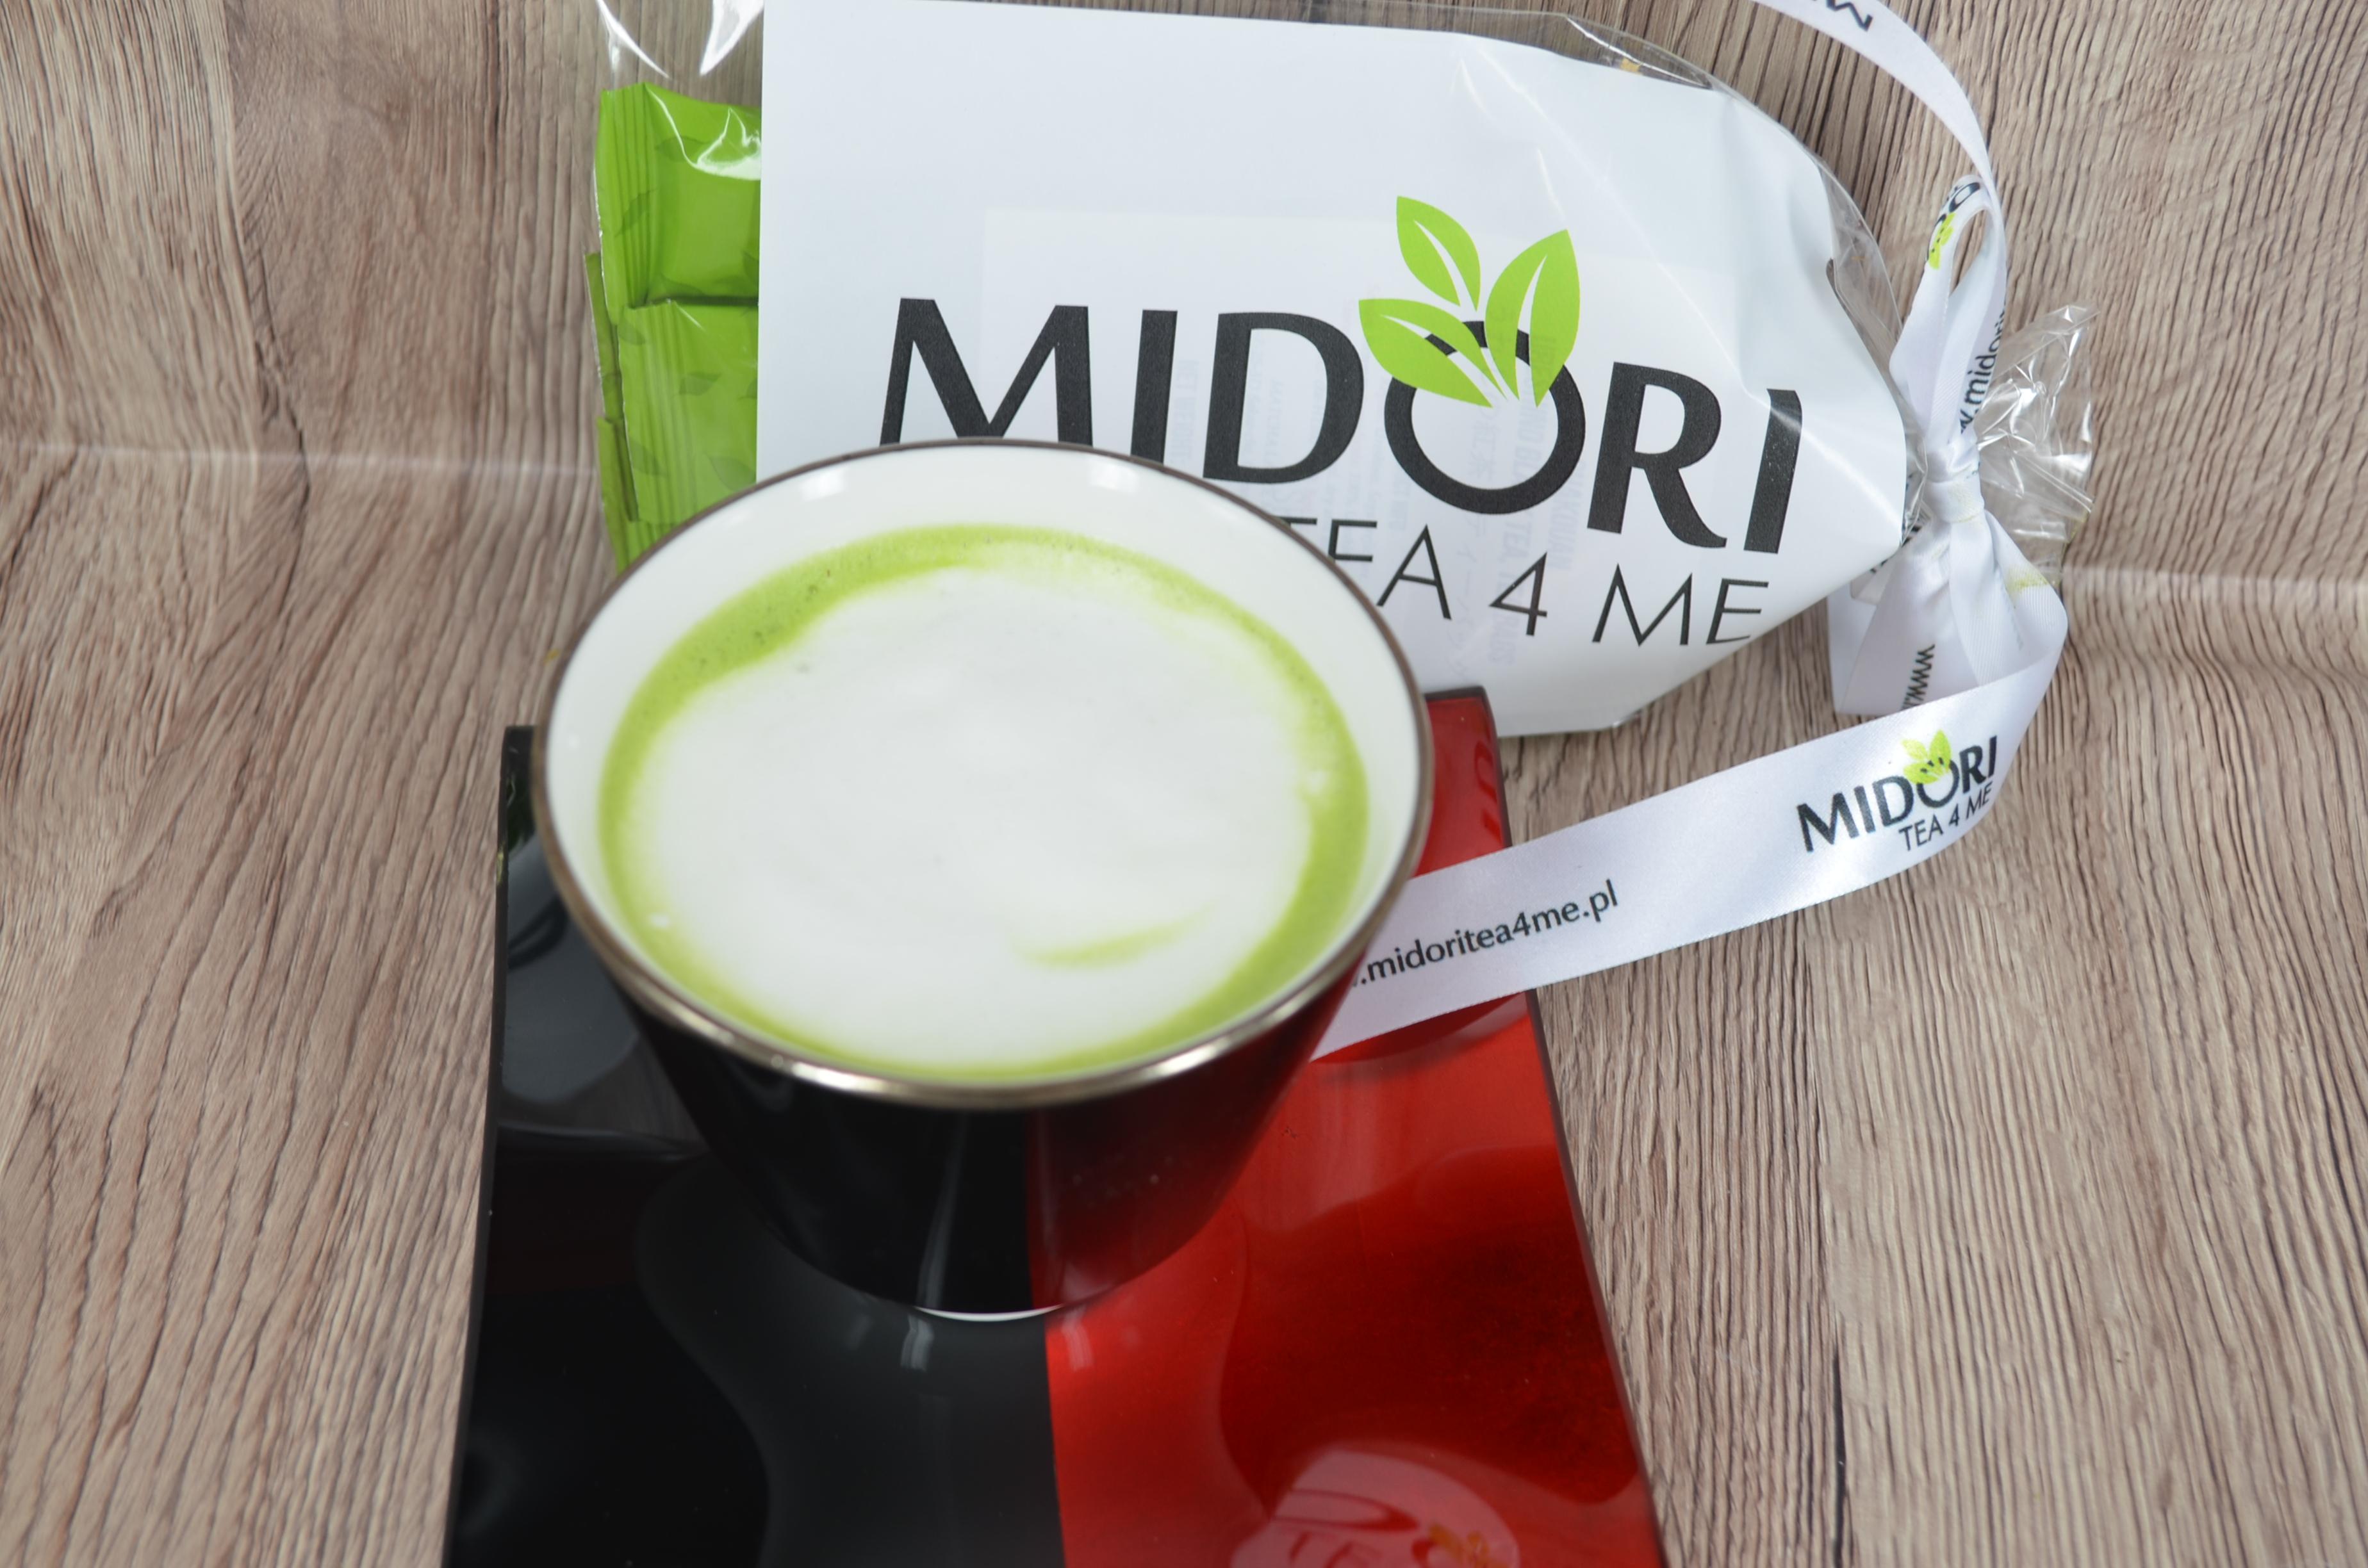 Napoje na bazie zielonej herbaty